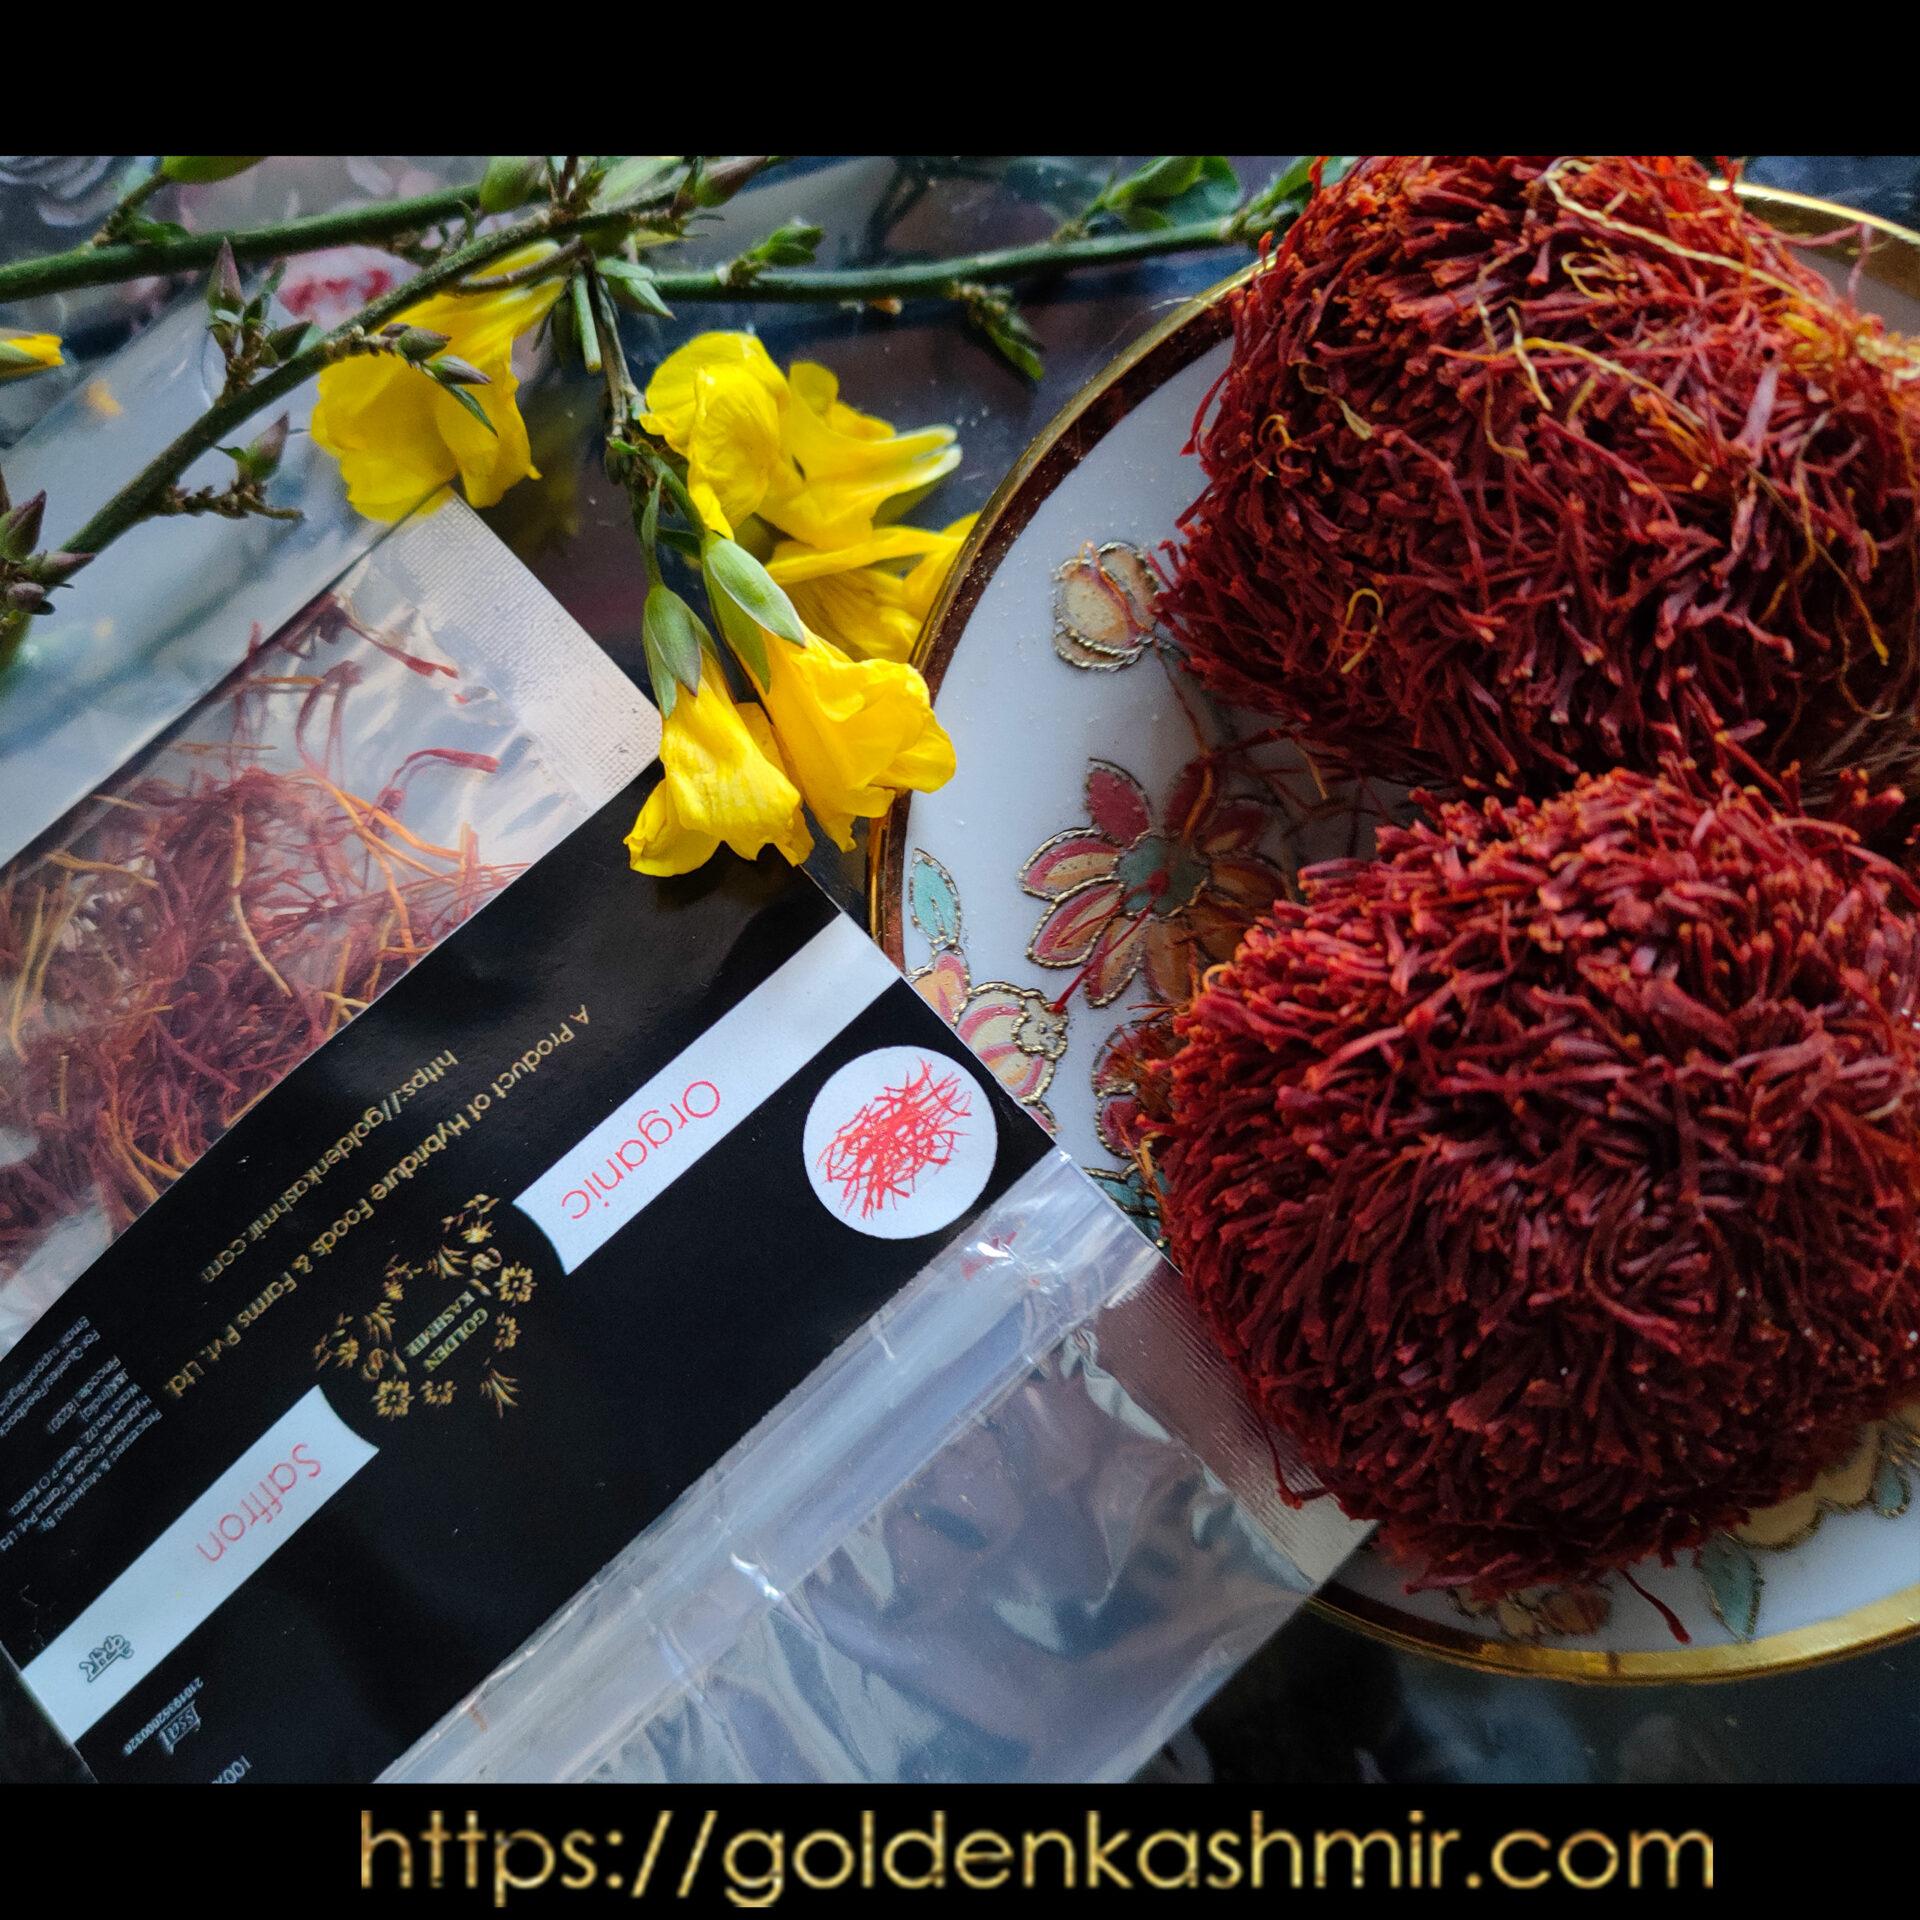 Golden Kashmir Premium Saffron (Kesar) | 1 Gram